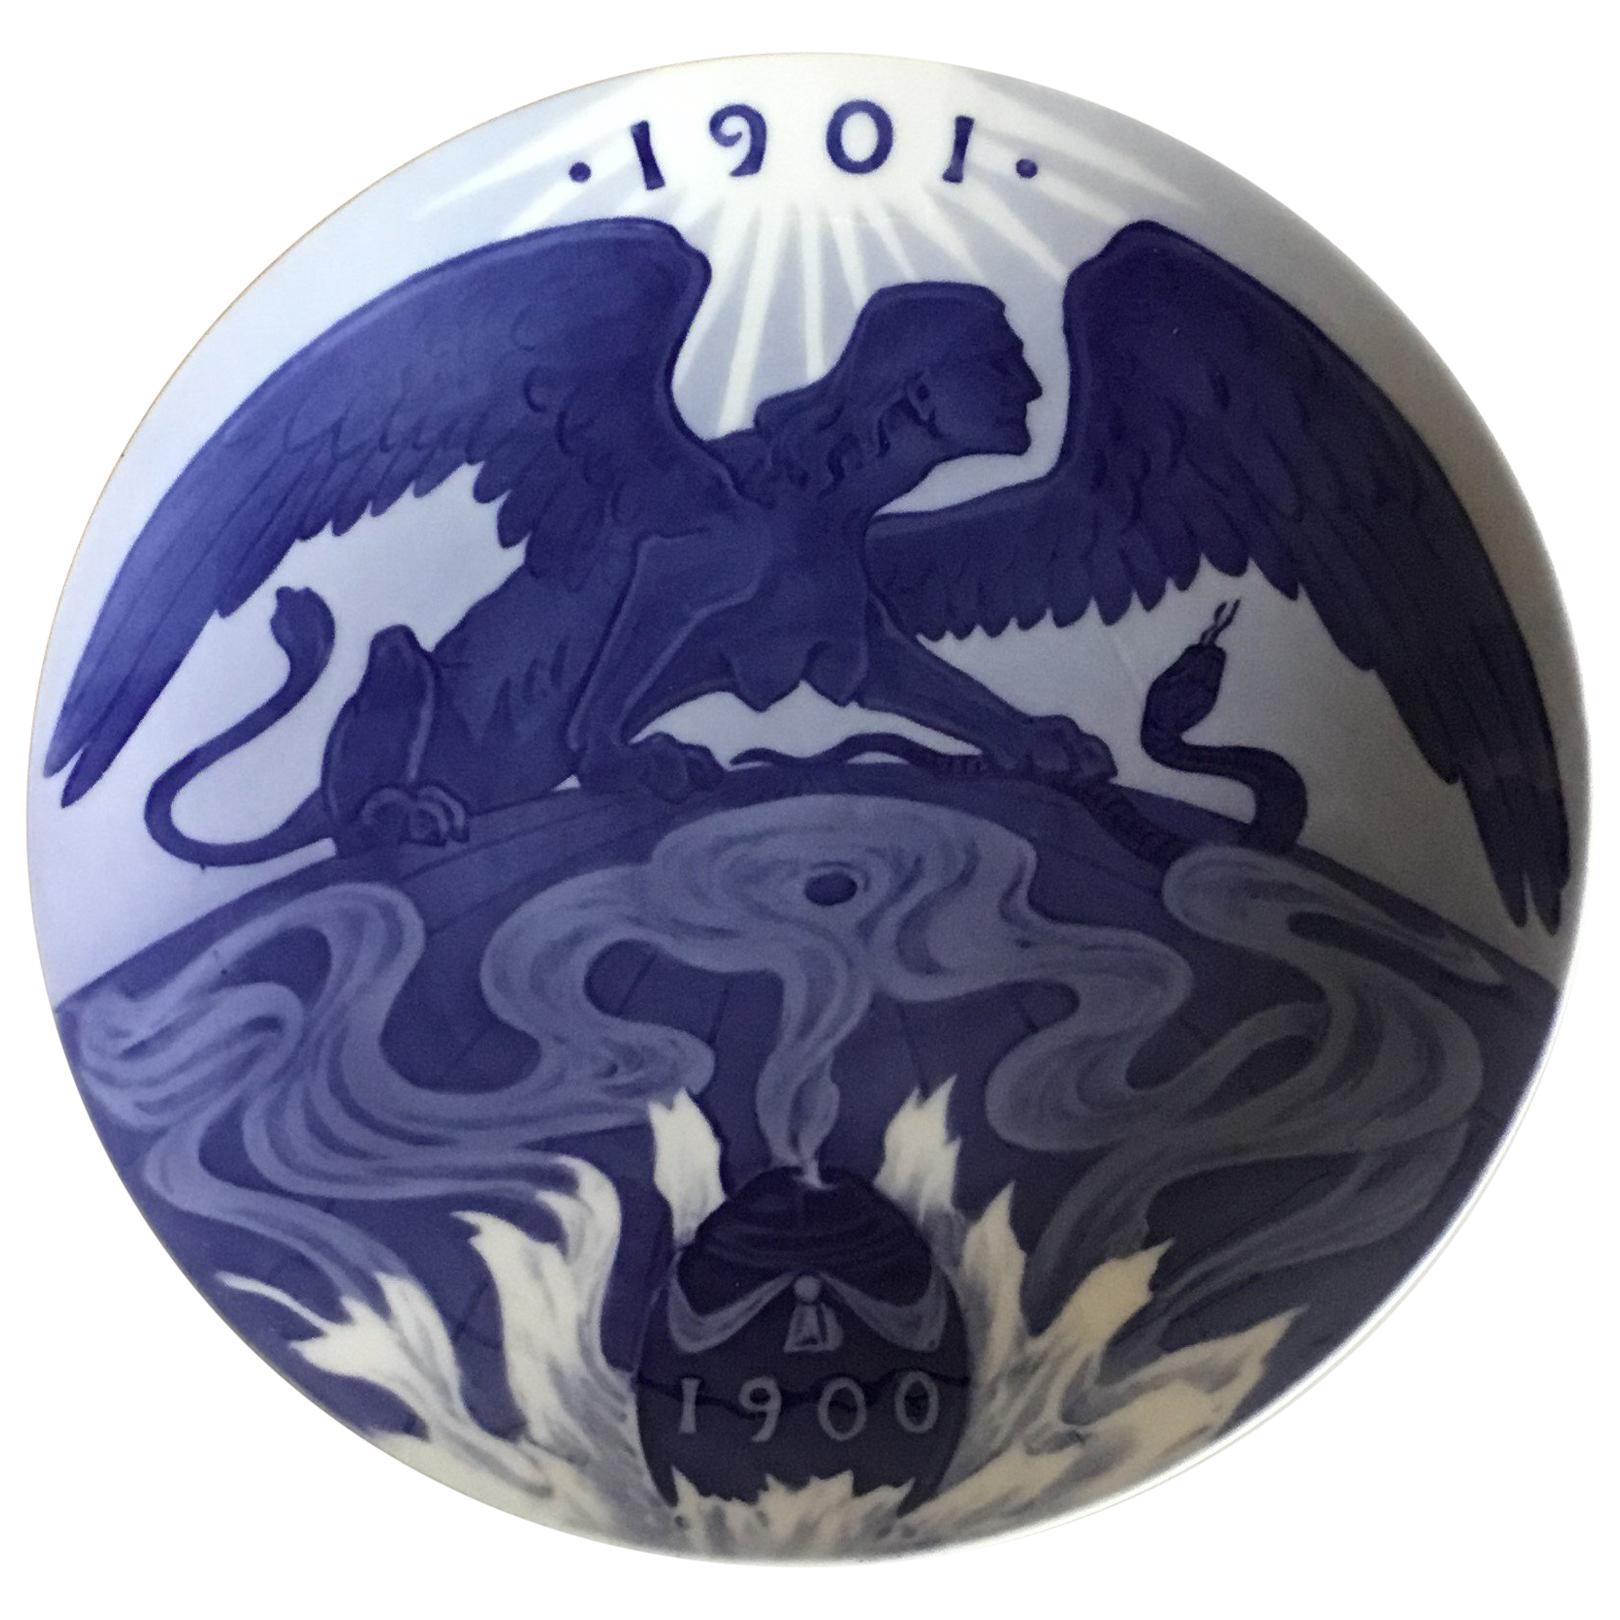 Royal Copenhagen Commemorative Plate from 1899 RC-CM39